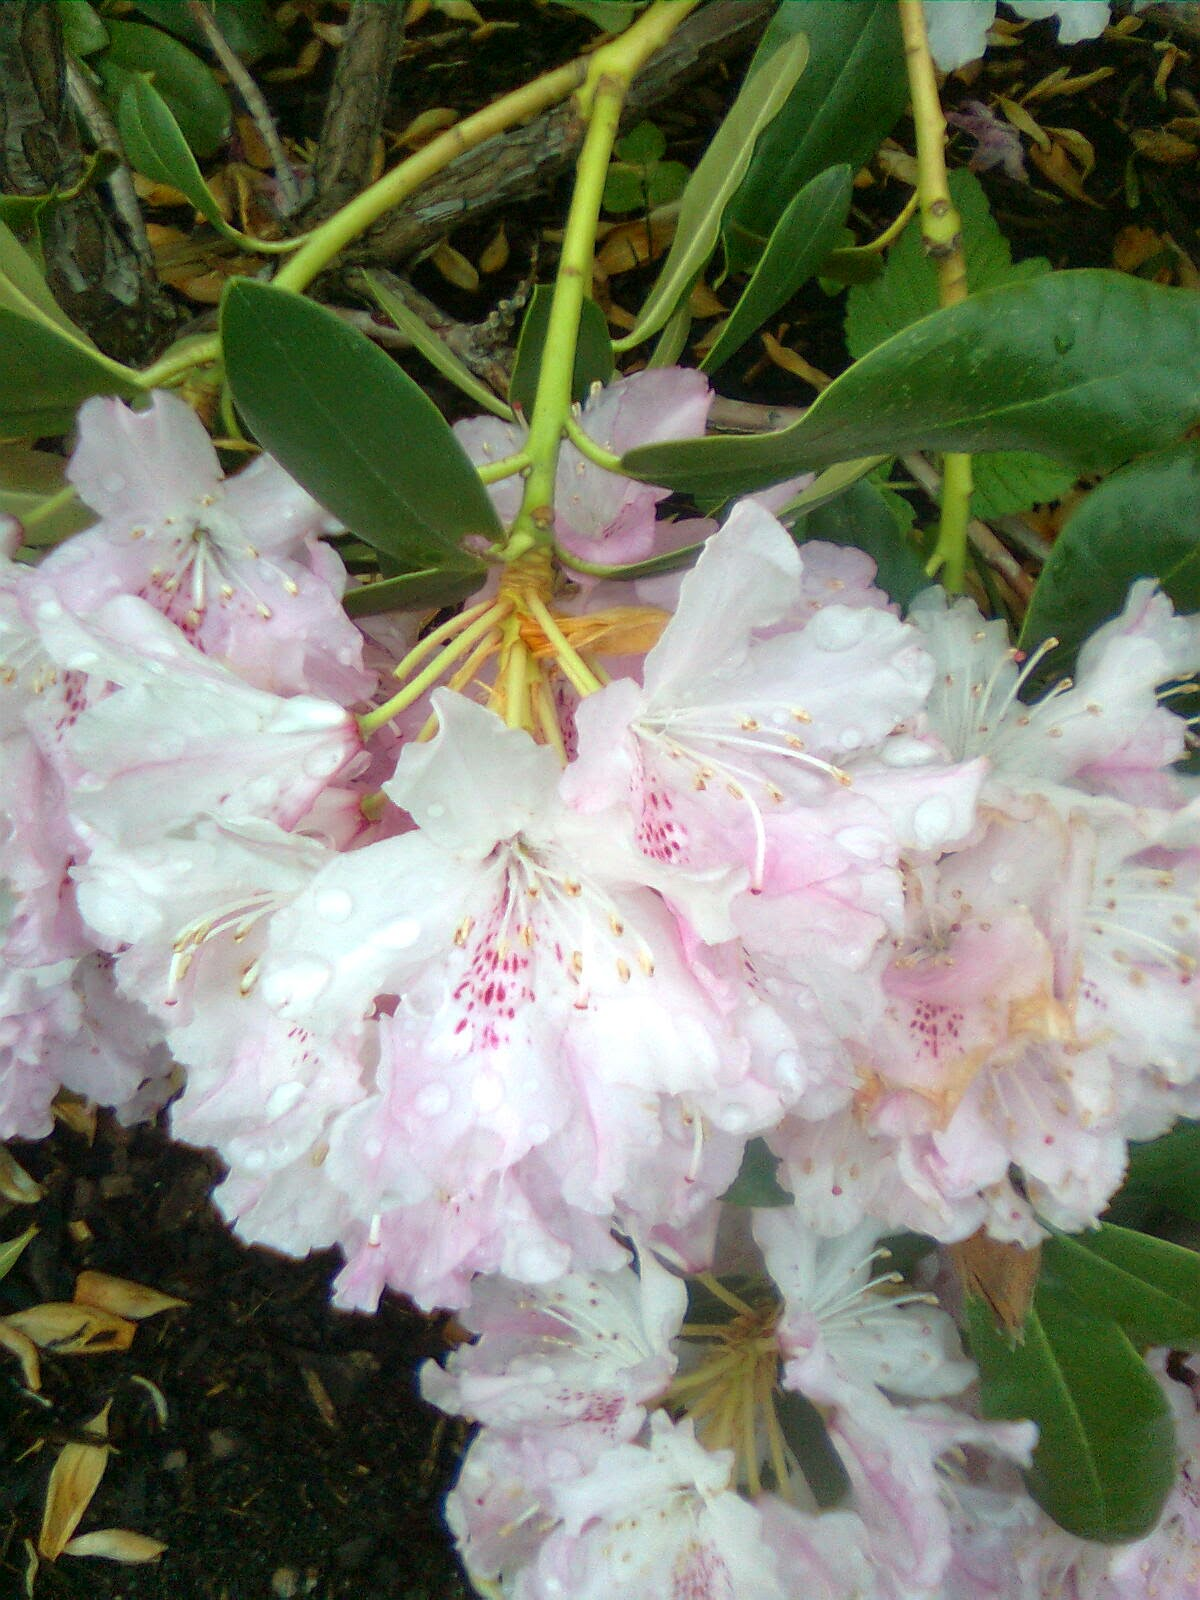 nar blomstrer rhododendron